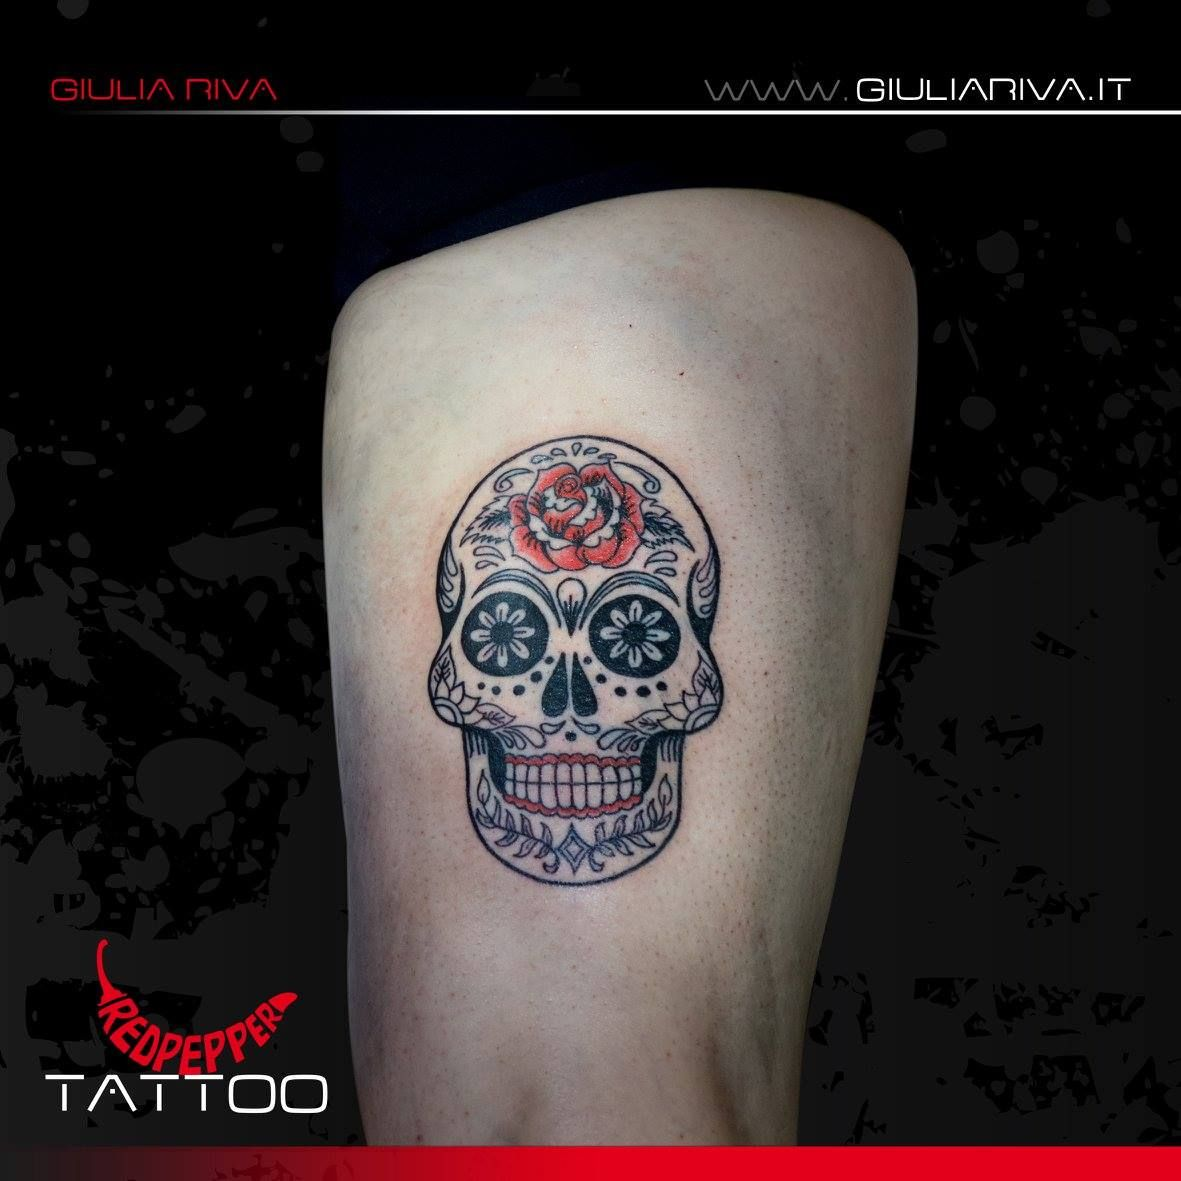 """Mexican calavera"" Tattoo #mexicancalavera #calavera #calaveratattoo #muertos #redpeppertattoo © Giulia Riva Art"